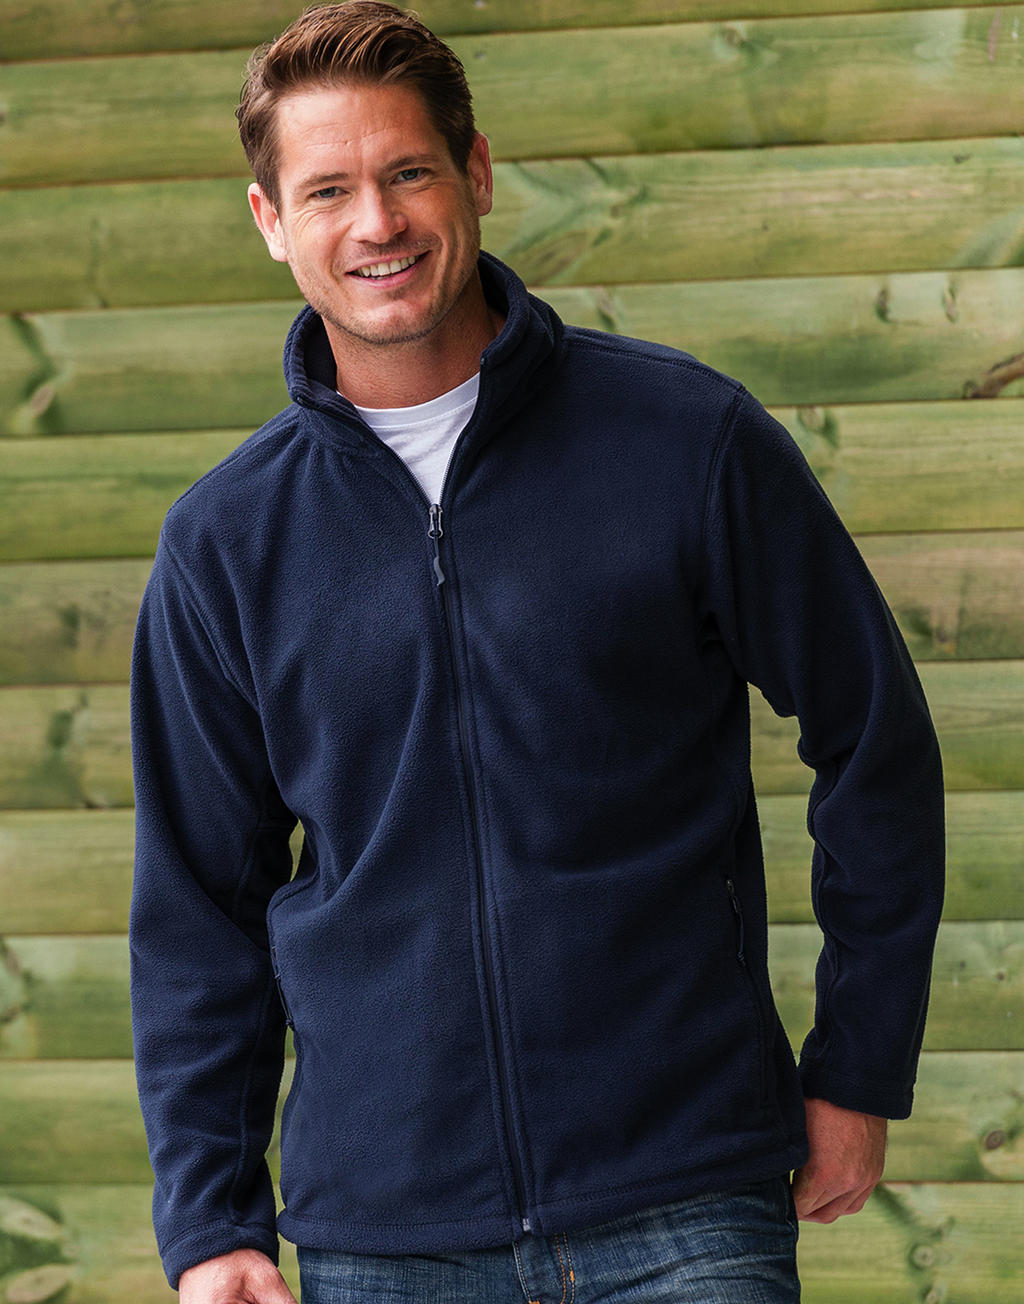 R-870M-0 Pánska fleecová bunda na zips